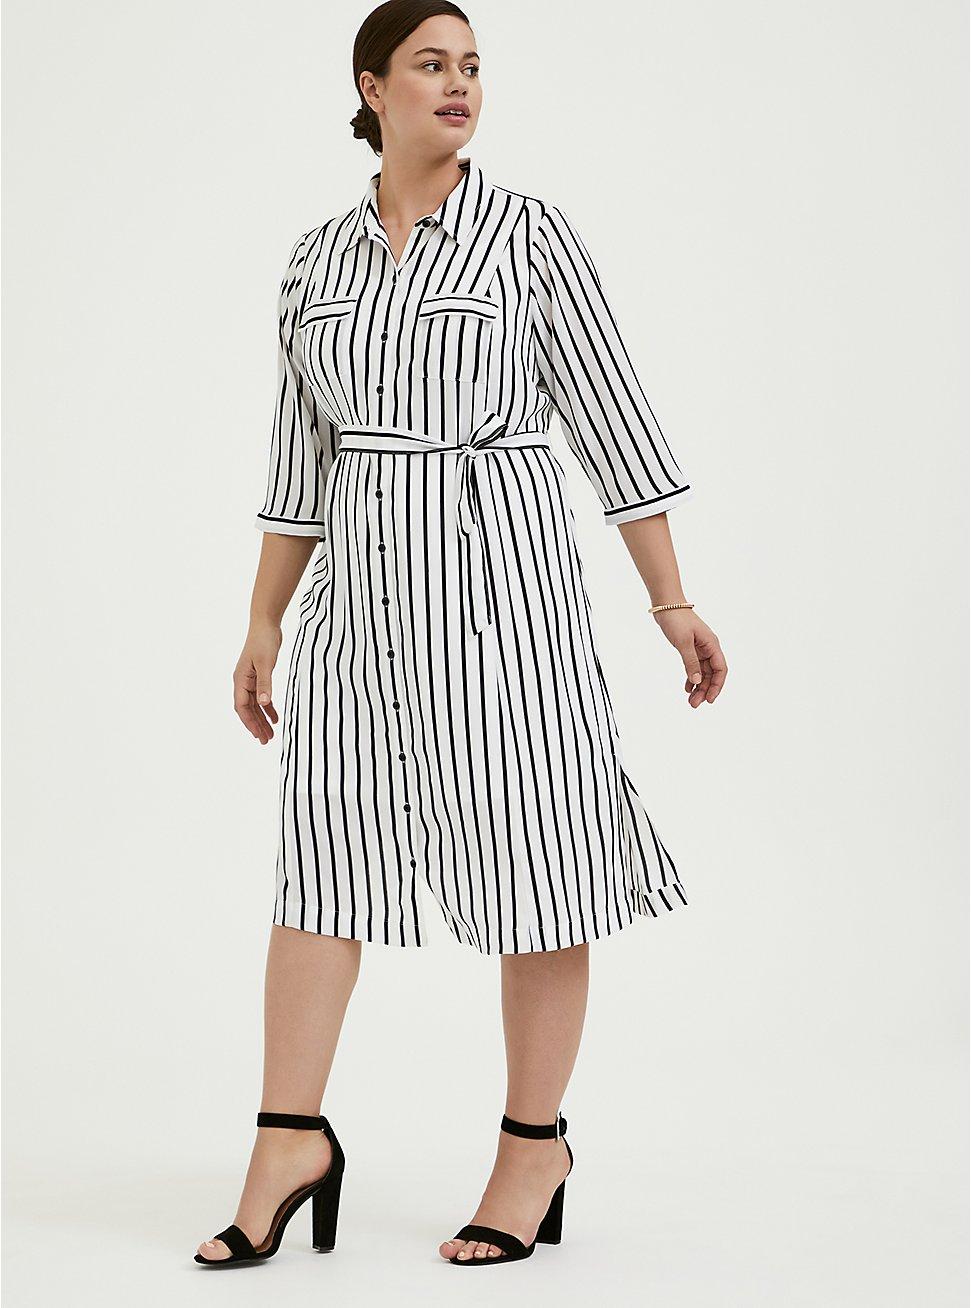 Plus Size Black & White Stripe Georgette Midi Shirt Dress, STRIPE-BLACK WHITE, hi-res